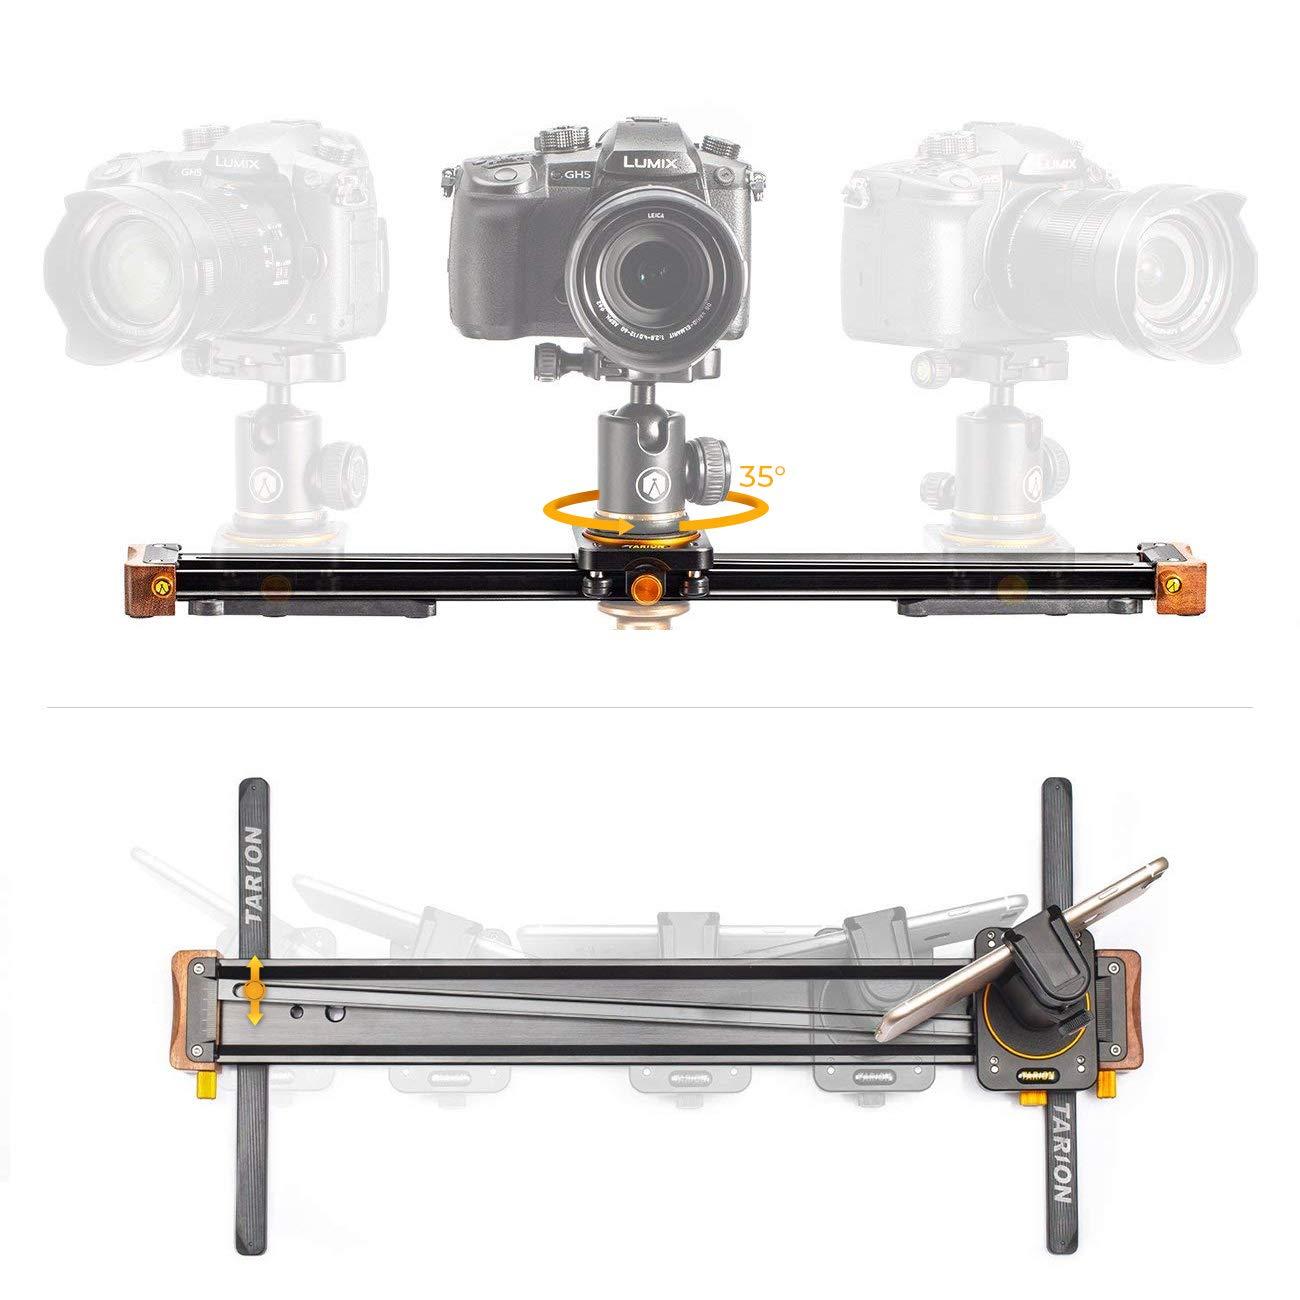 TARION V-20 Camera Slider 20'' Video Track Slider Rail Dolly Aluminum 35 ° Rotation 8.8 LB Load for DSLR Cameras Phones by TARION